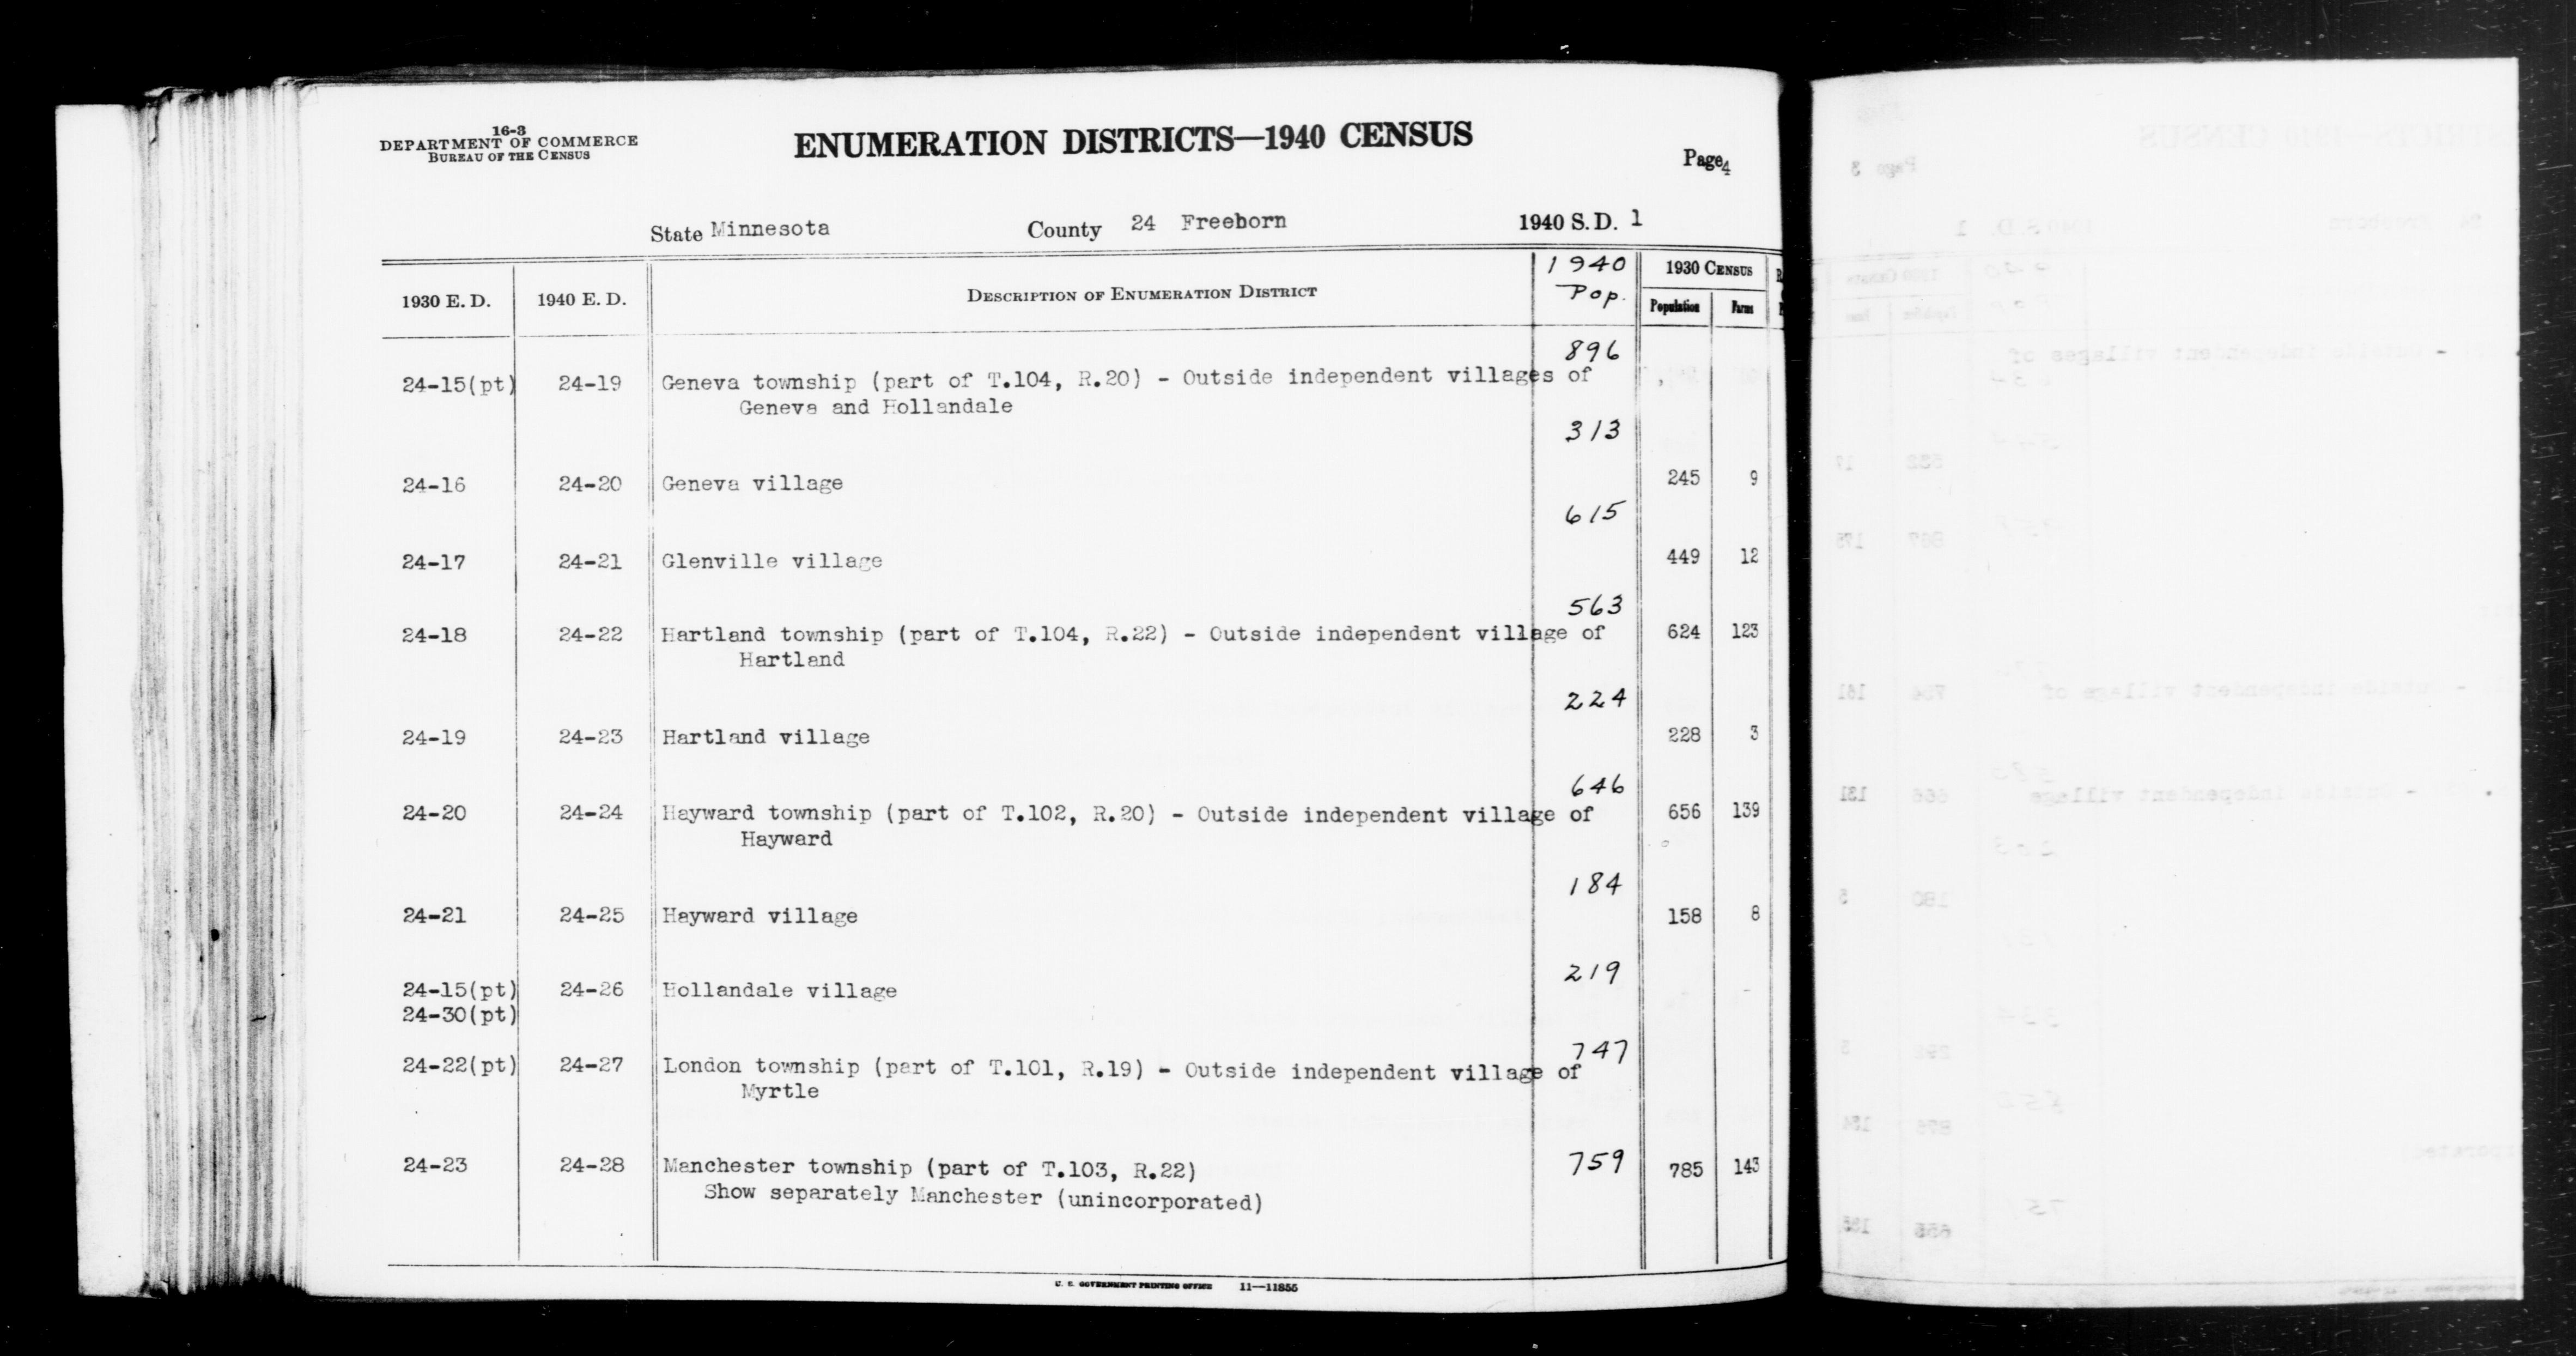 1940 Census Enumeration District Descriptions - Minnesota - Freeborn County - ED 24-19, ED 24-20, ED 24-21, ED 24-22, ED 24-23, ED 24-24, ED 24-25, ED 24-26, ED 24-27, ED 24-28